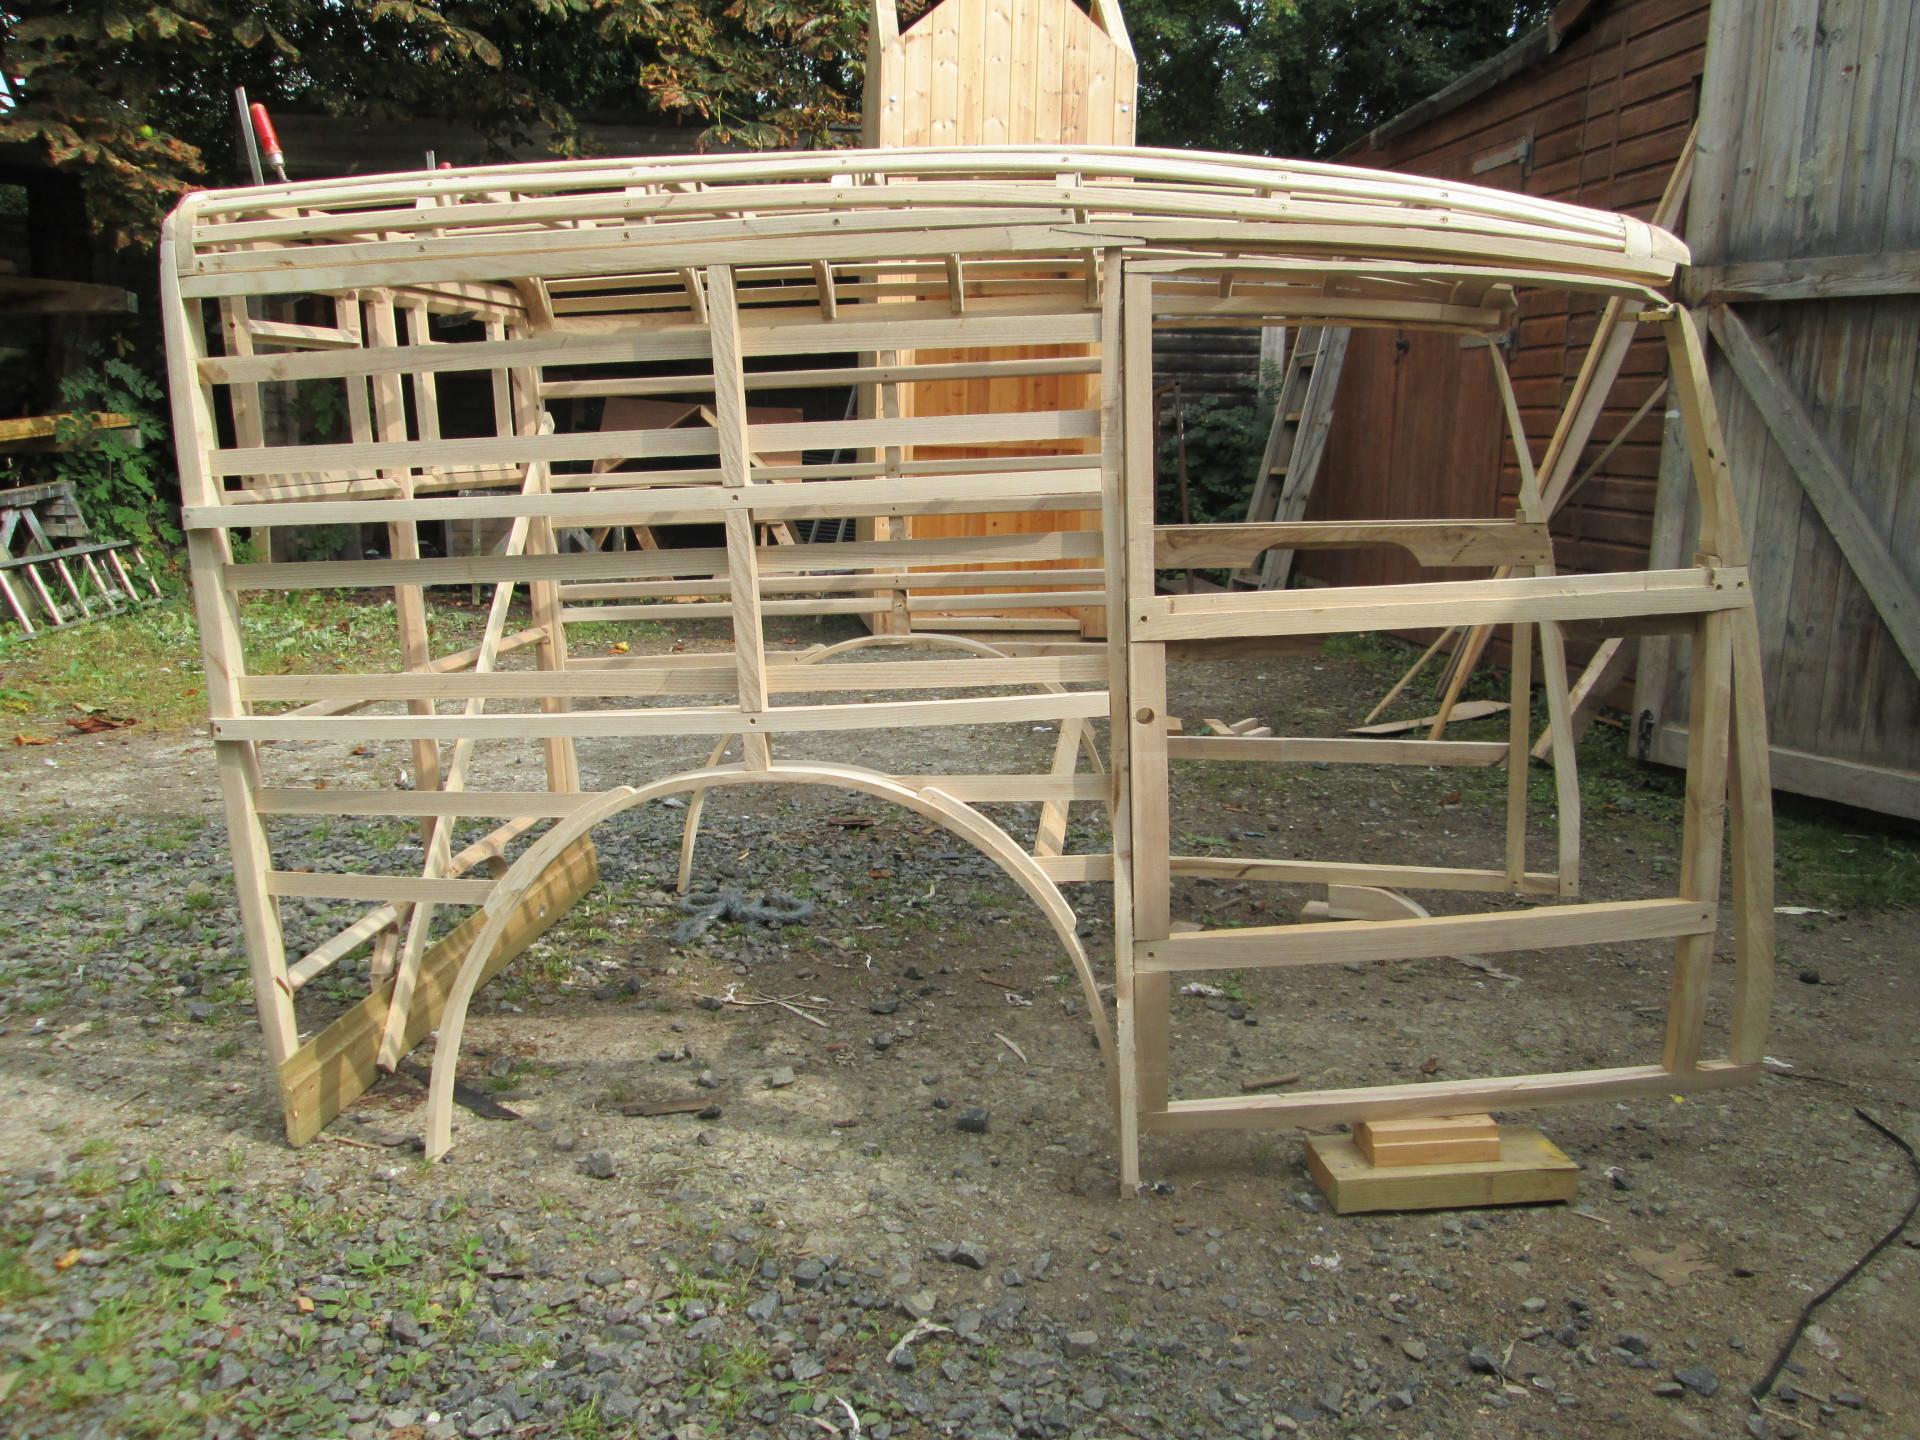 Austin Seven woodwork specialists